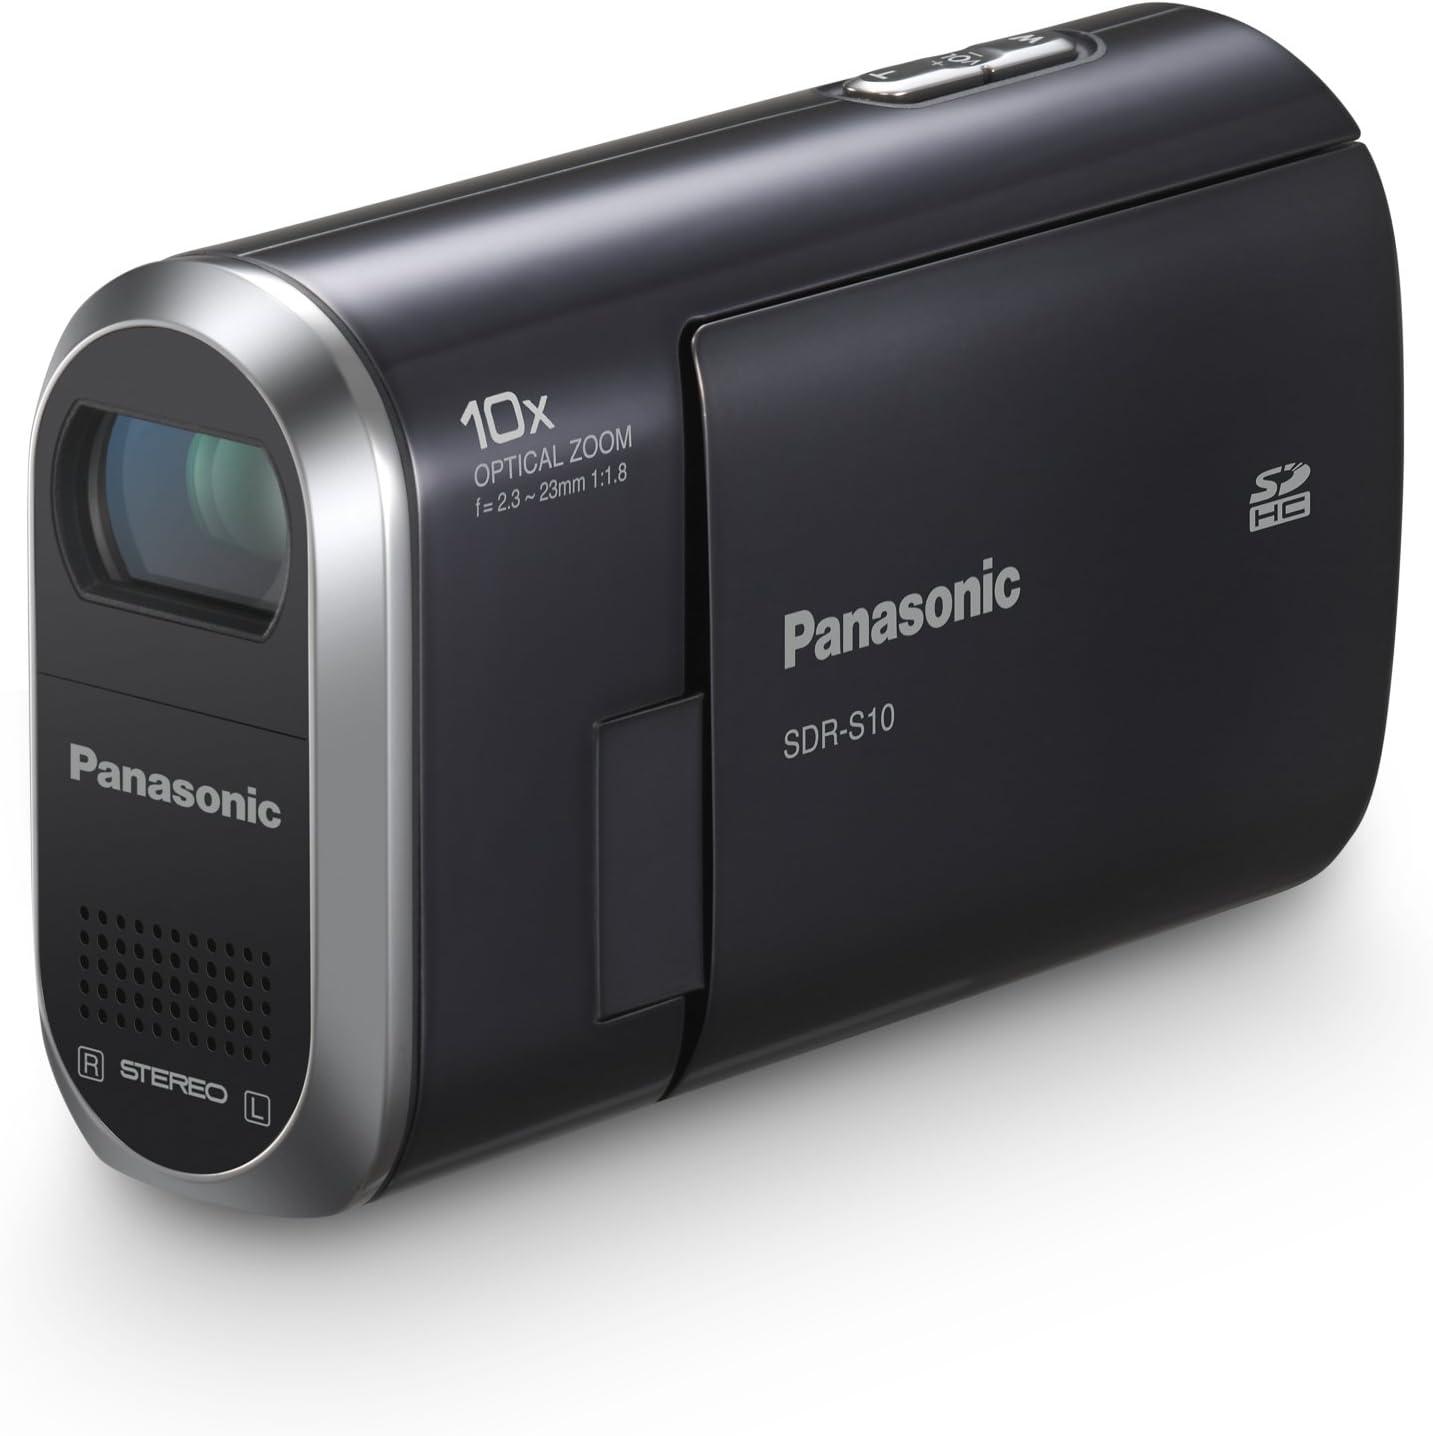 SD Panasonic SDR-S10P1 Camcorder Memory Card 2 x 2GB Standard Secure Digital 1 Twin Pack Memory Card